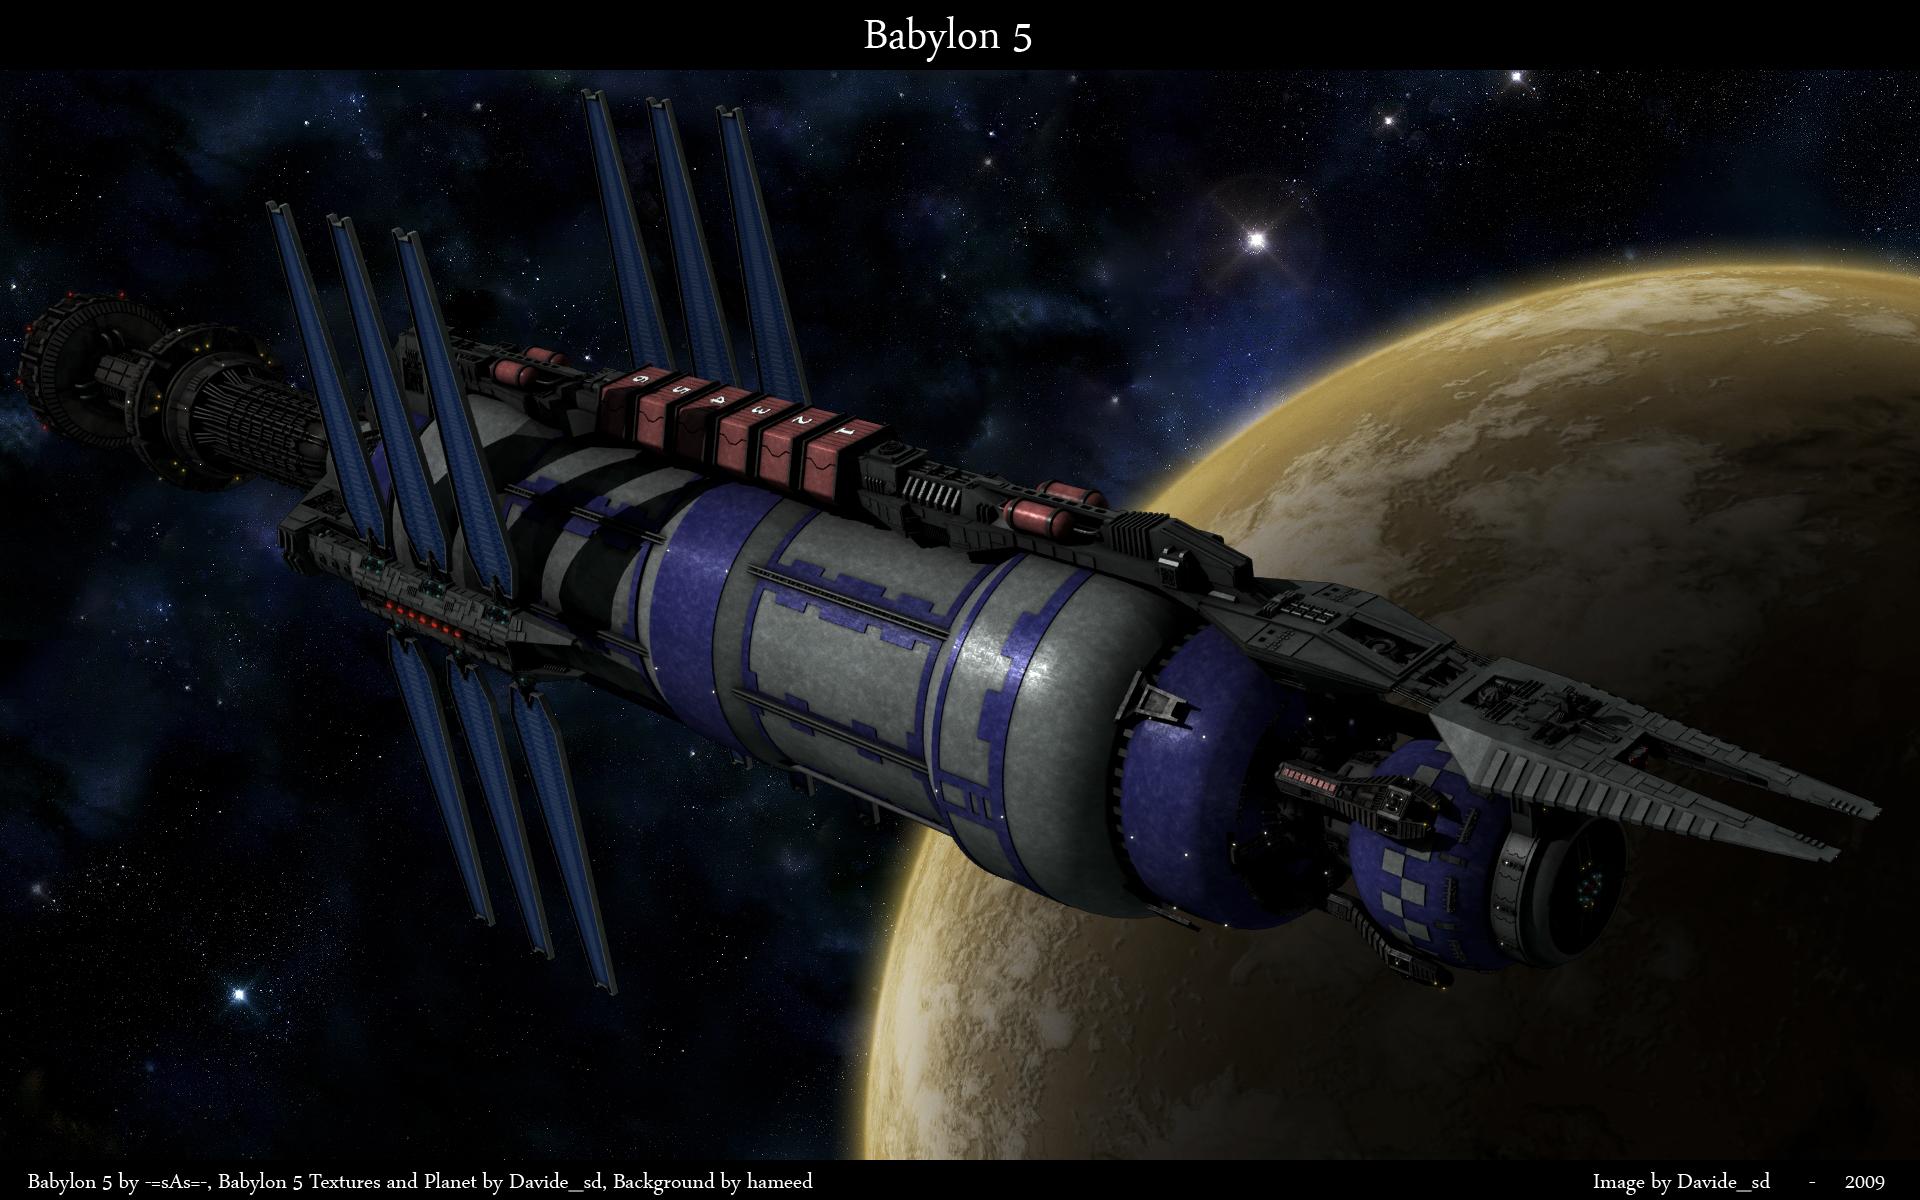 Babylon 5 by Davide-sd